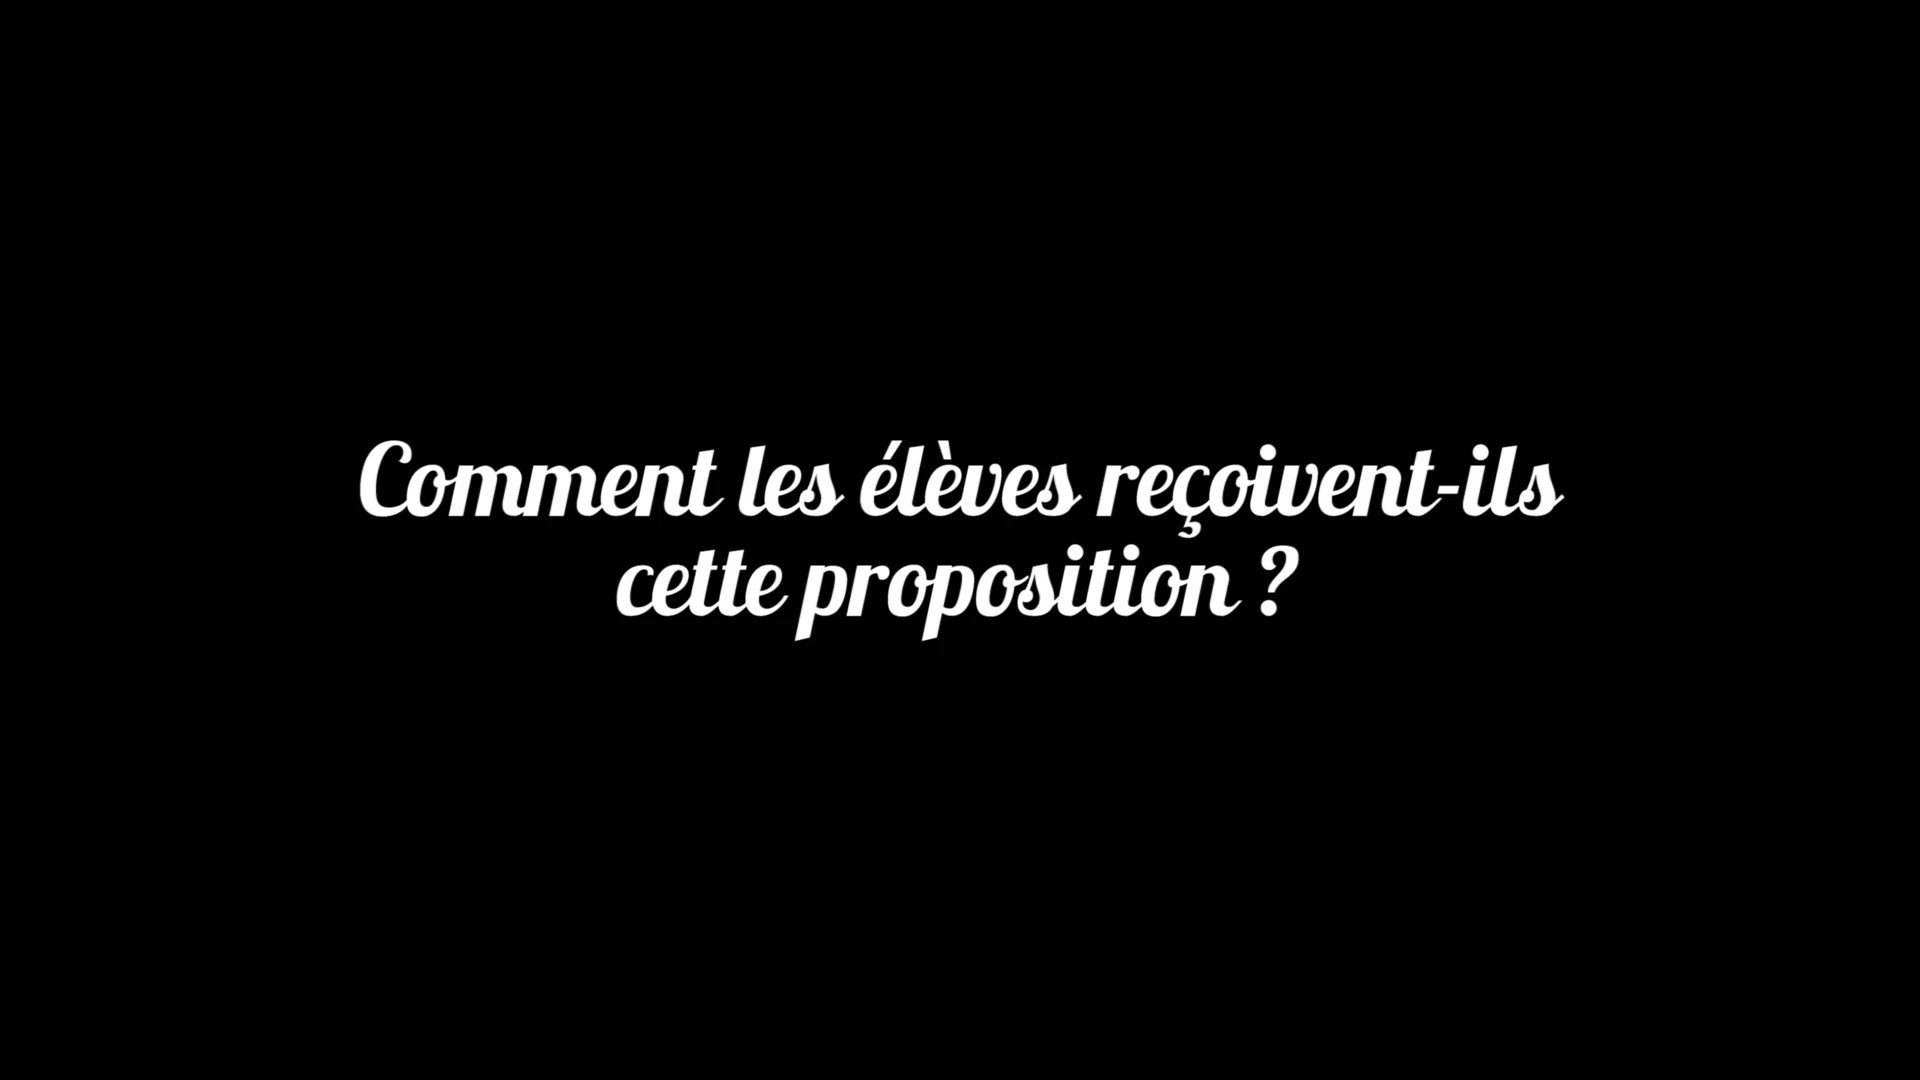 Dominique Viennot, interview